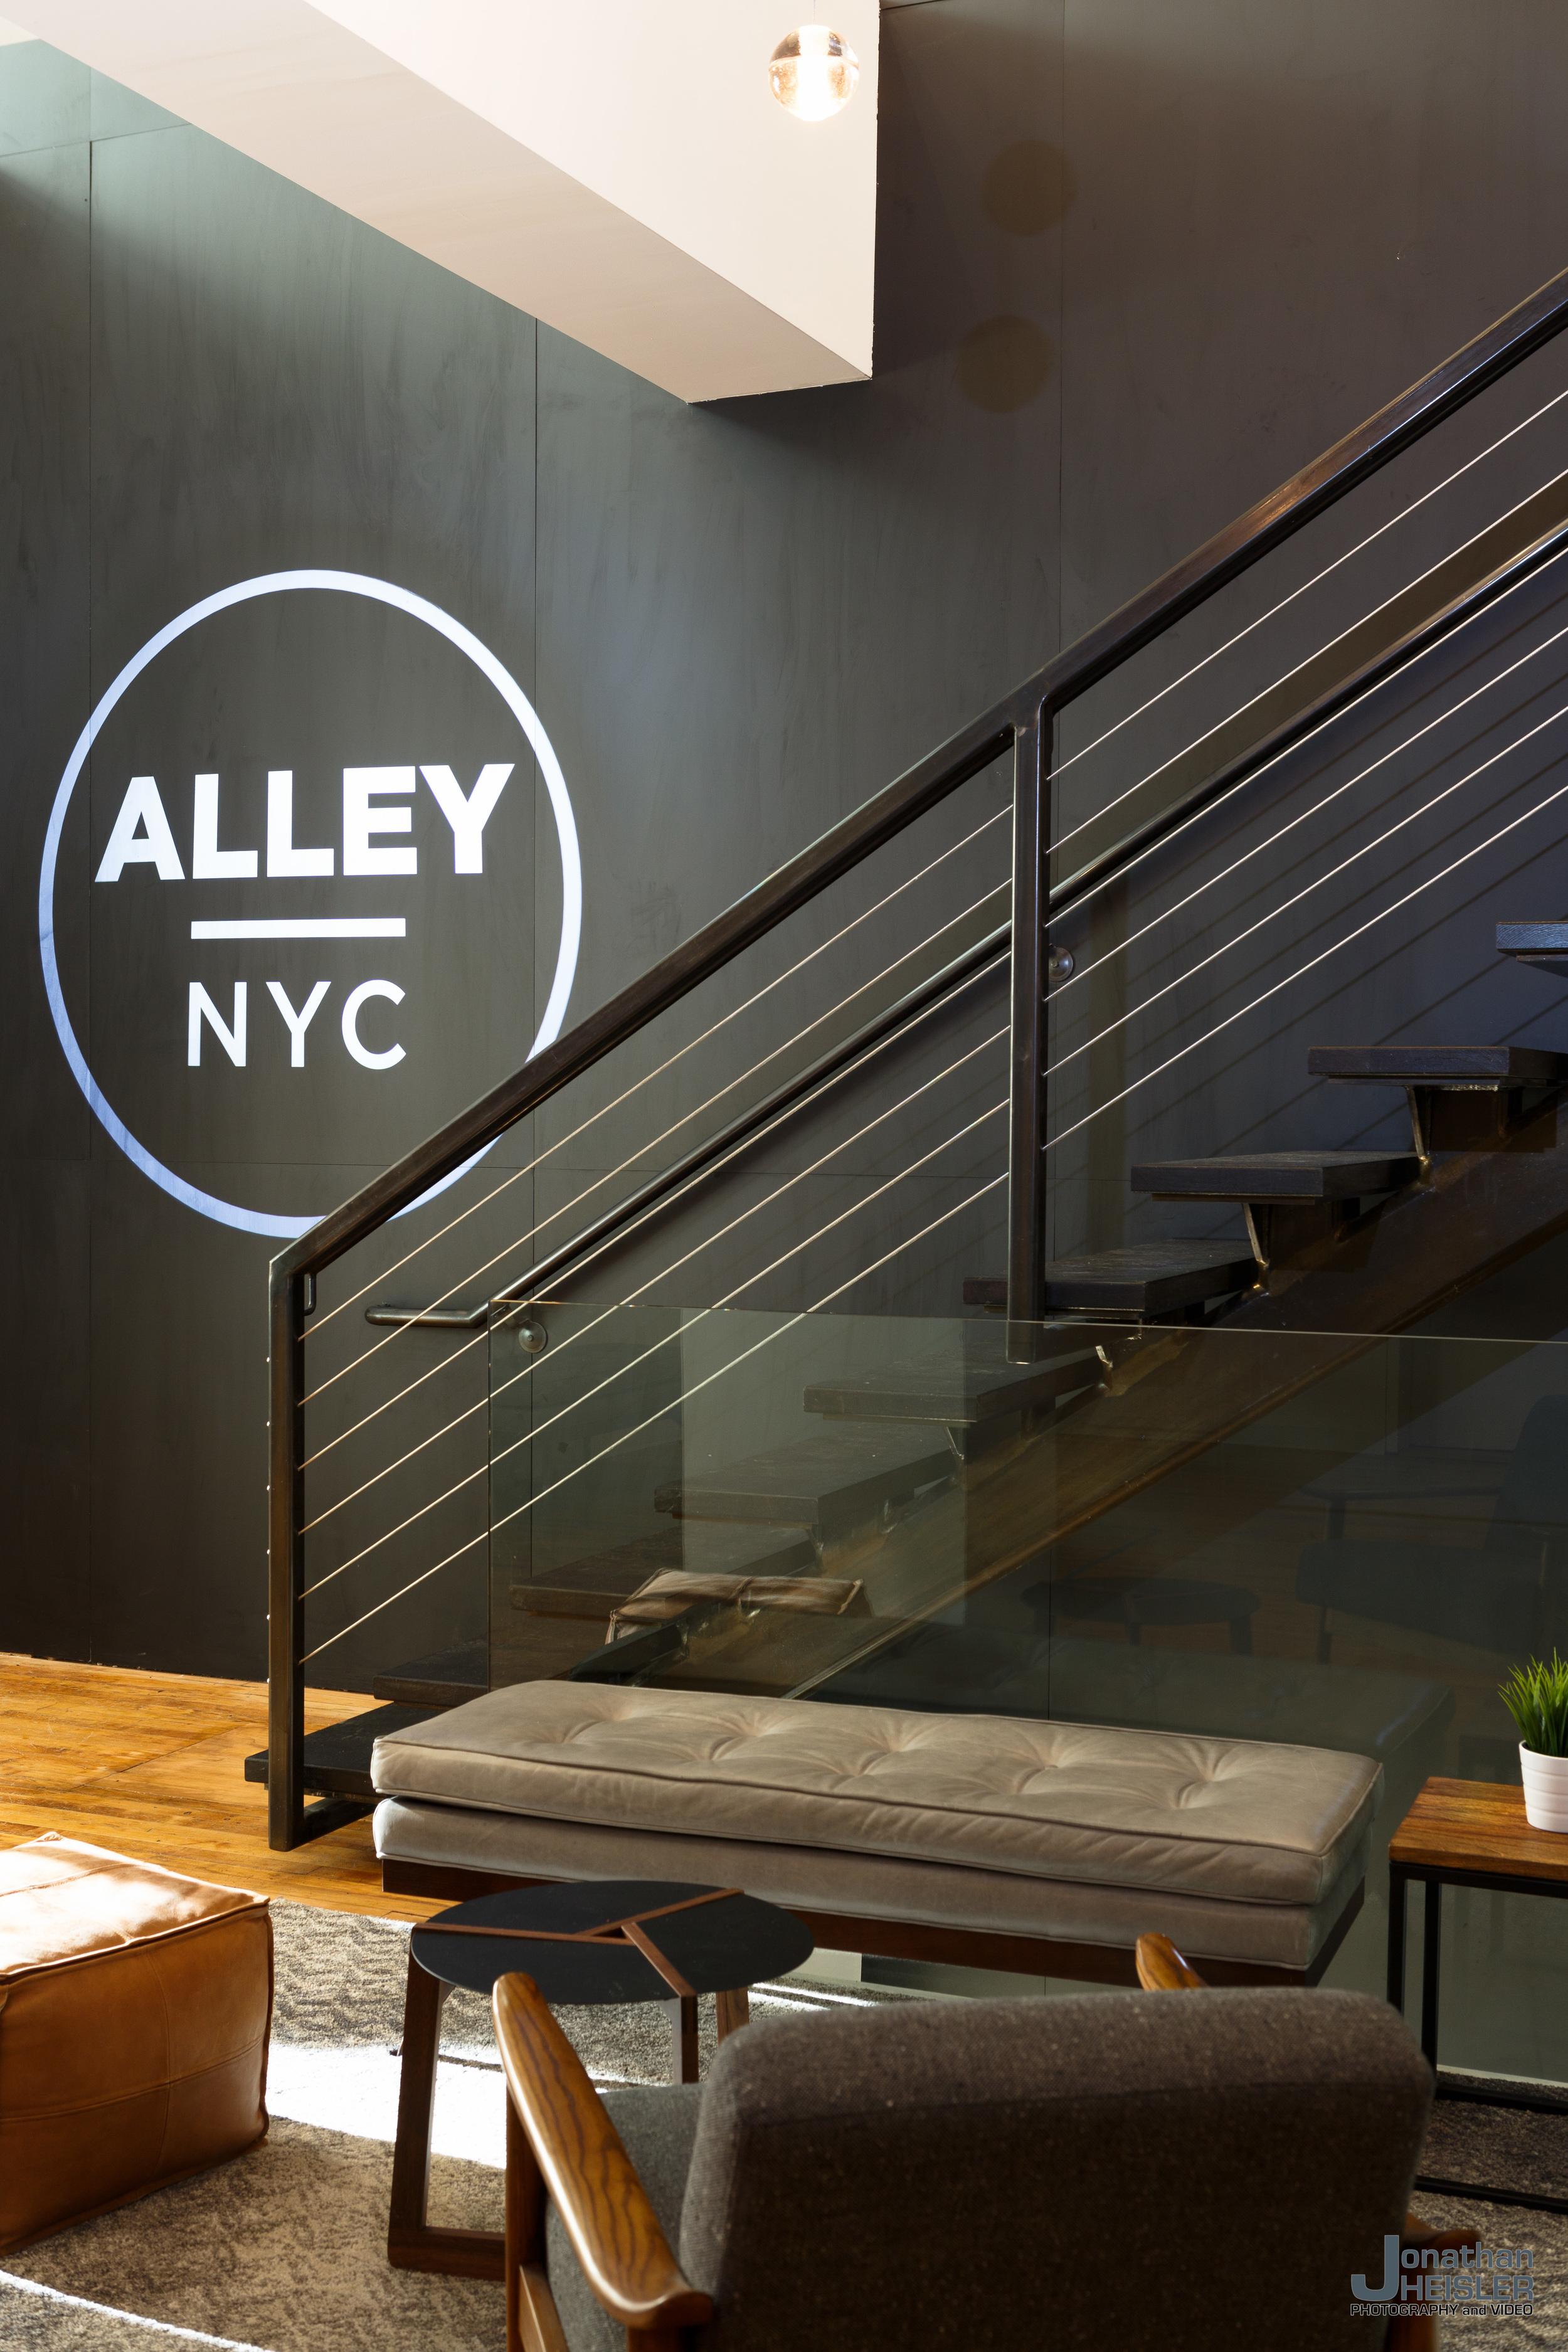 Alley NYC_ NYC Creative Space __  Jonathan Heisler _ 1.7.2013_008.jpg